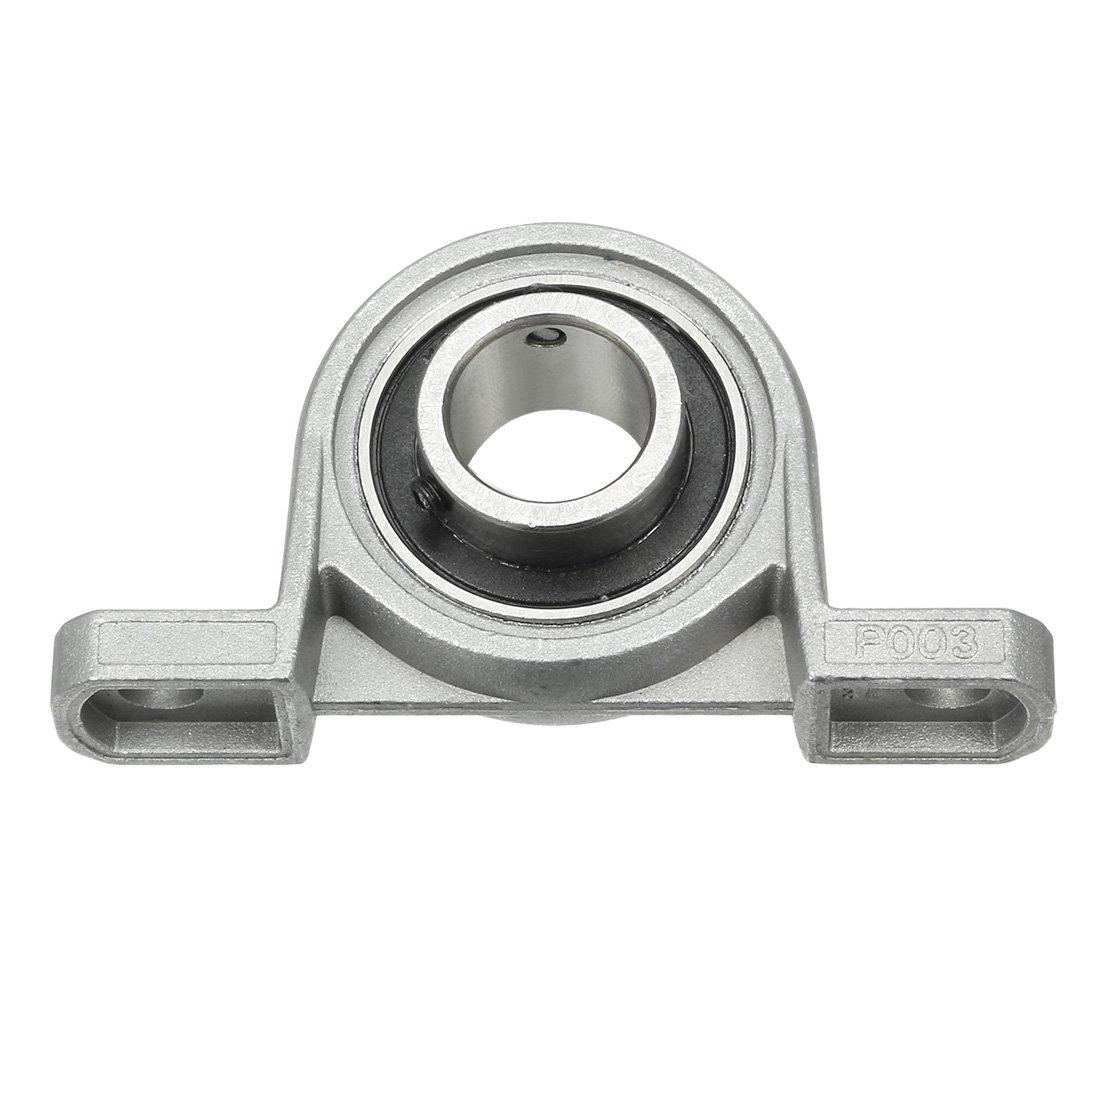 uxcell 2 Pcs KFL001 12mm Zinc-Aluminum Alloy Flange Pillow Block Bearing